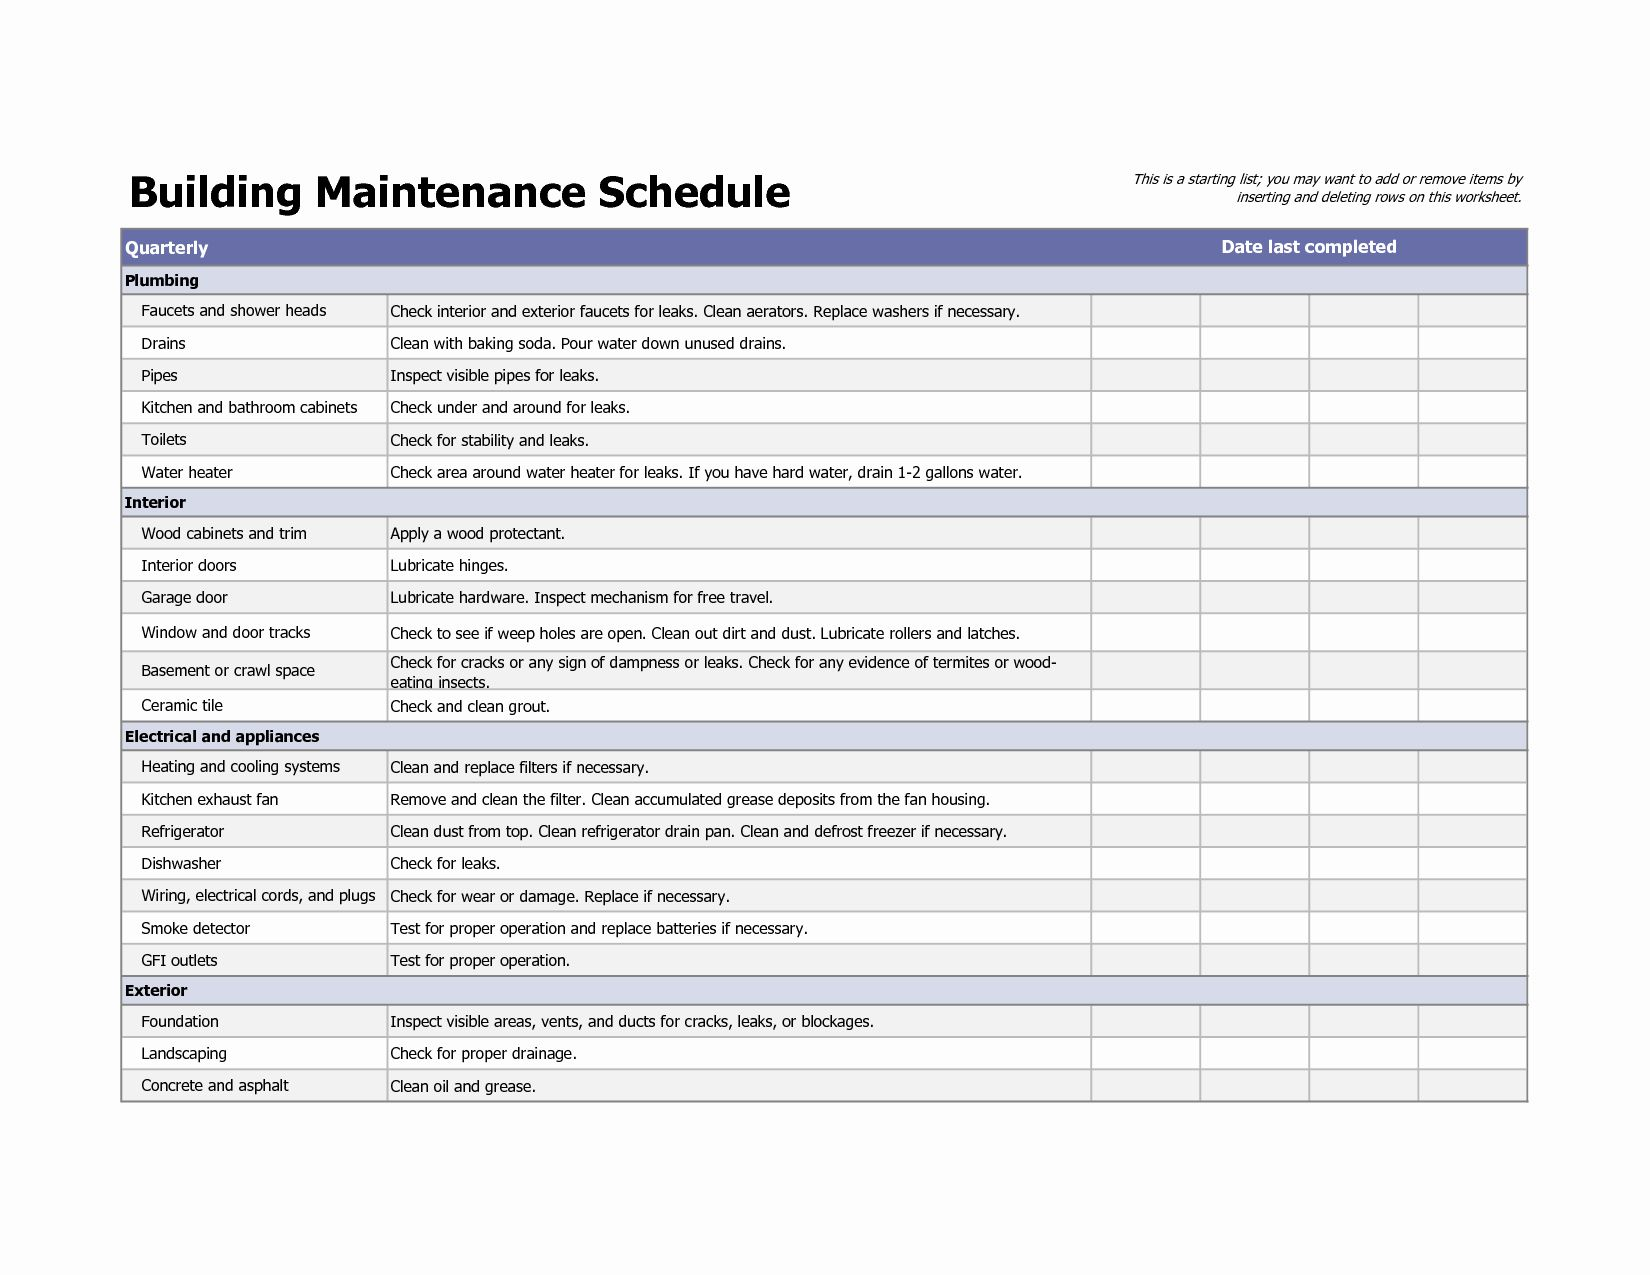 Facility Maintenance Checklist Template Fresh Building Maintenance Schedule Excel Templ Building Maintenance Facilities Maintenance Cleaning Schedule Templates Building maintenance checklist template free